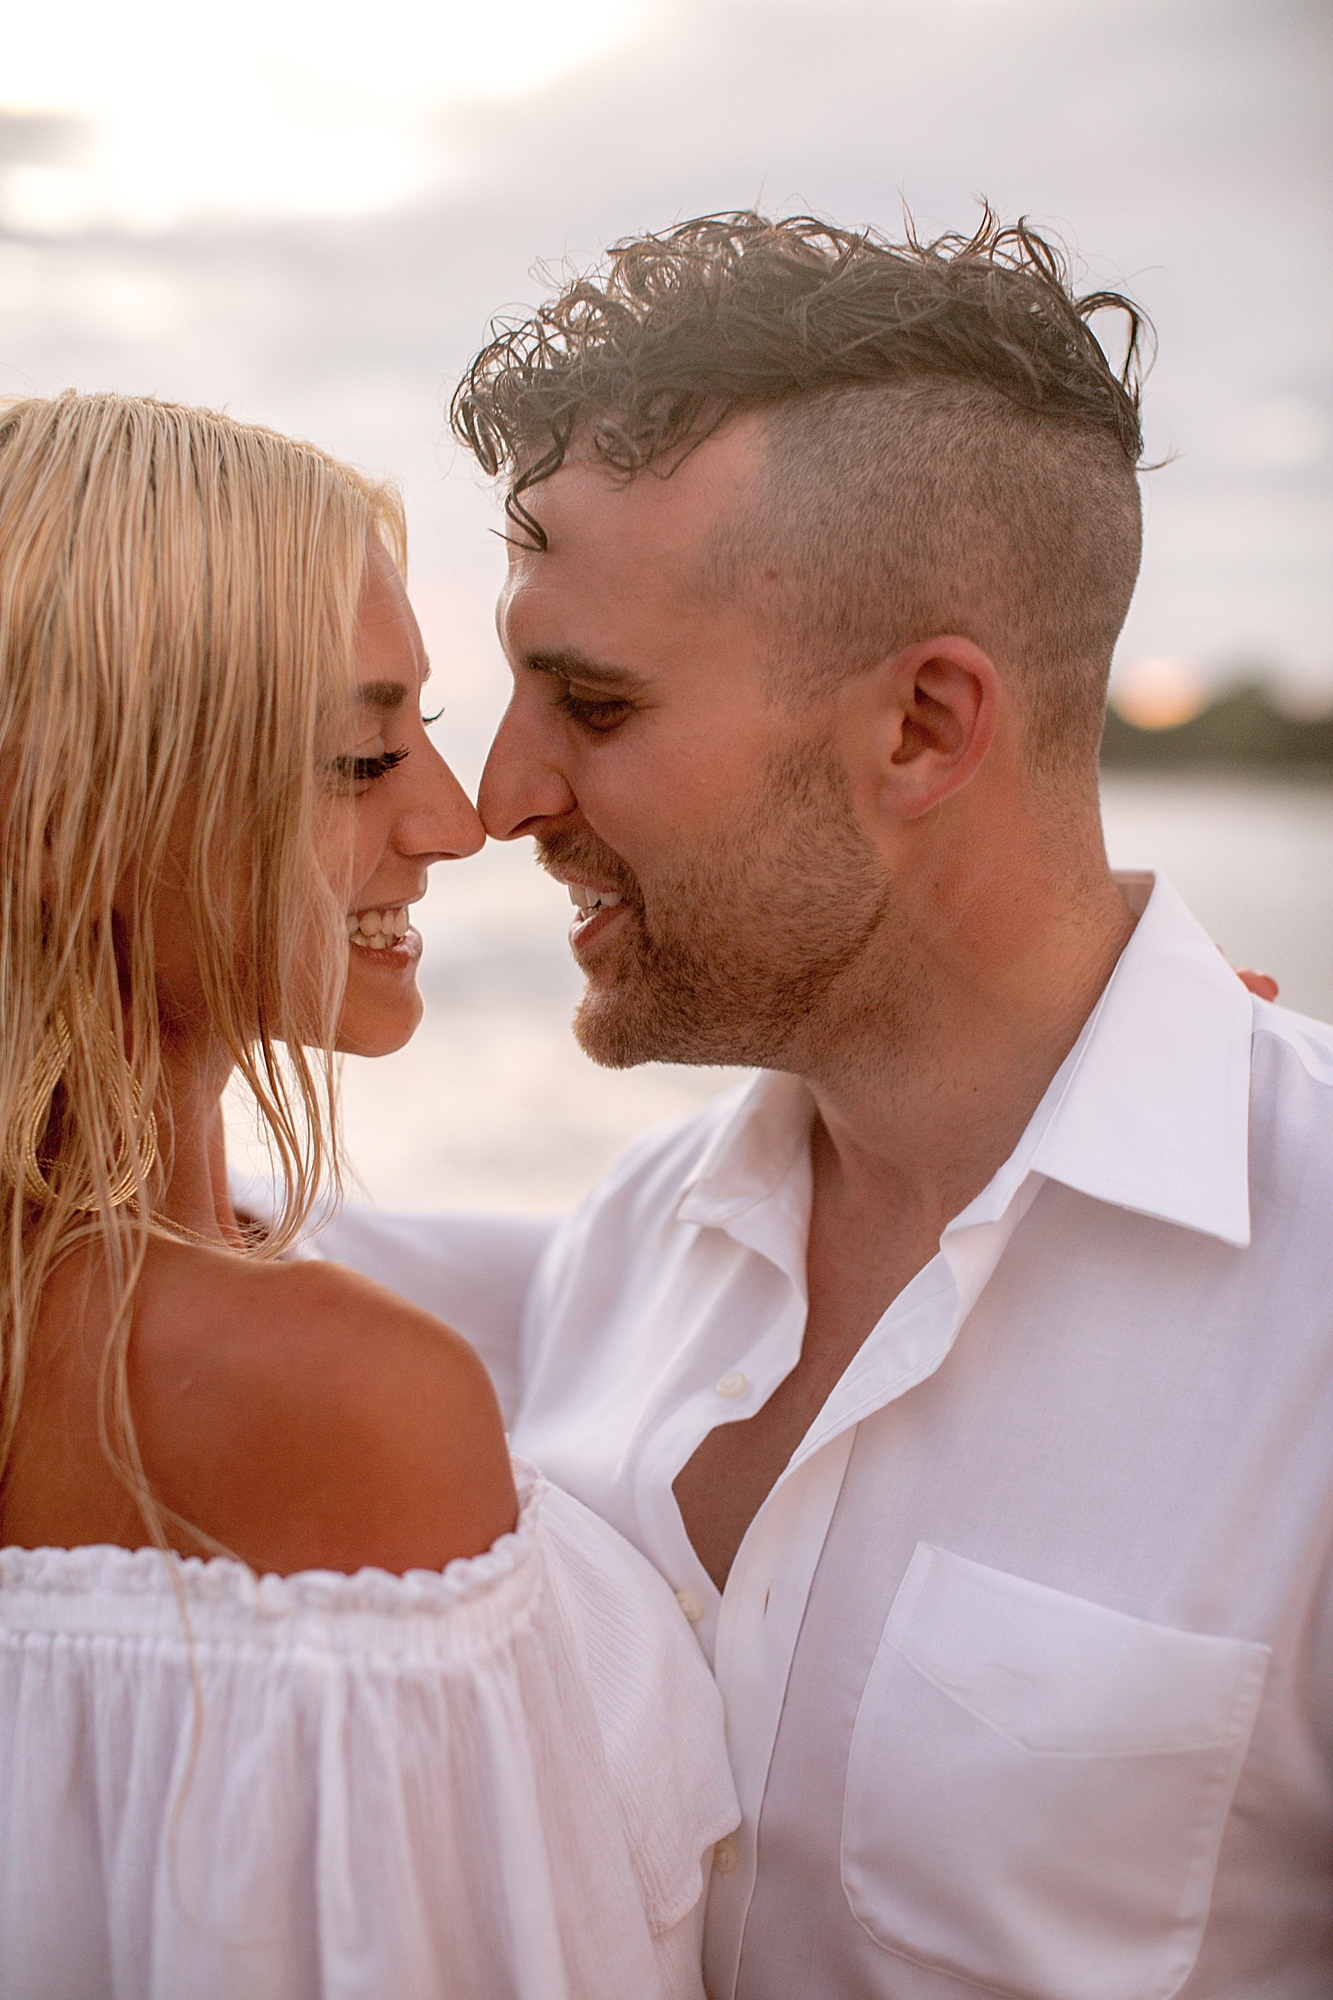 Epic and Adventurous Travel Wedding and Portrait Photographer in Nosara, Costa Rica - Kelee Bovelle @xokelee @keleeb - 13.jpg